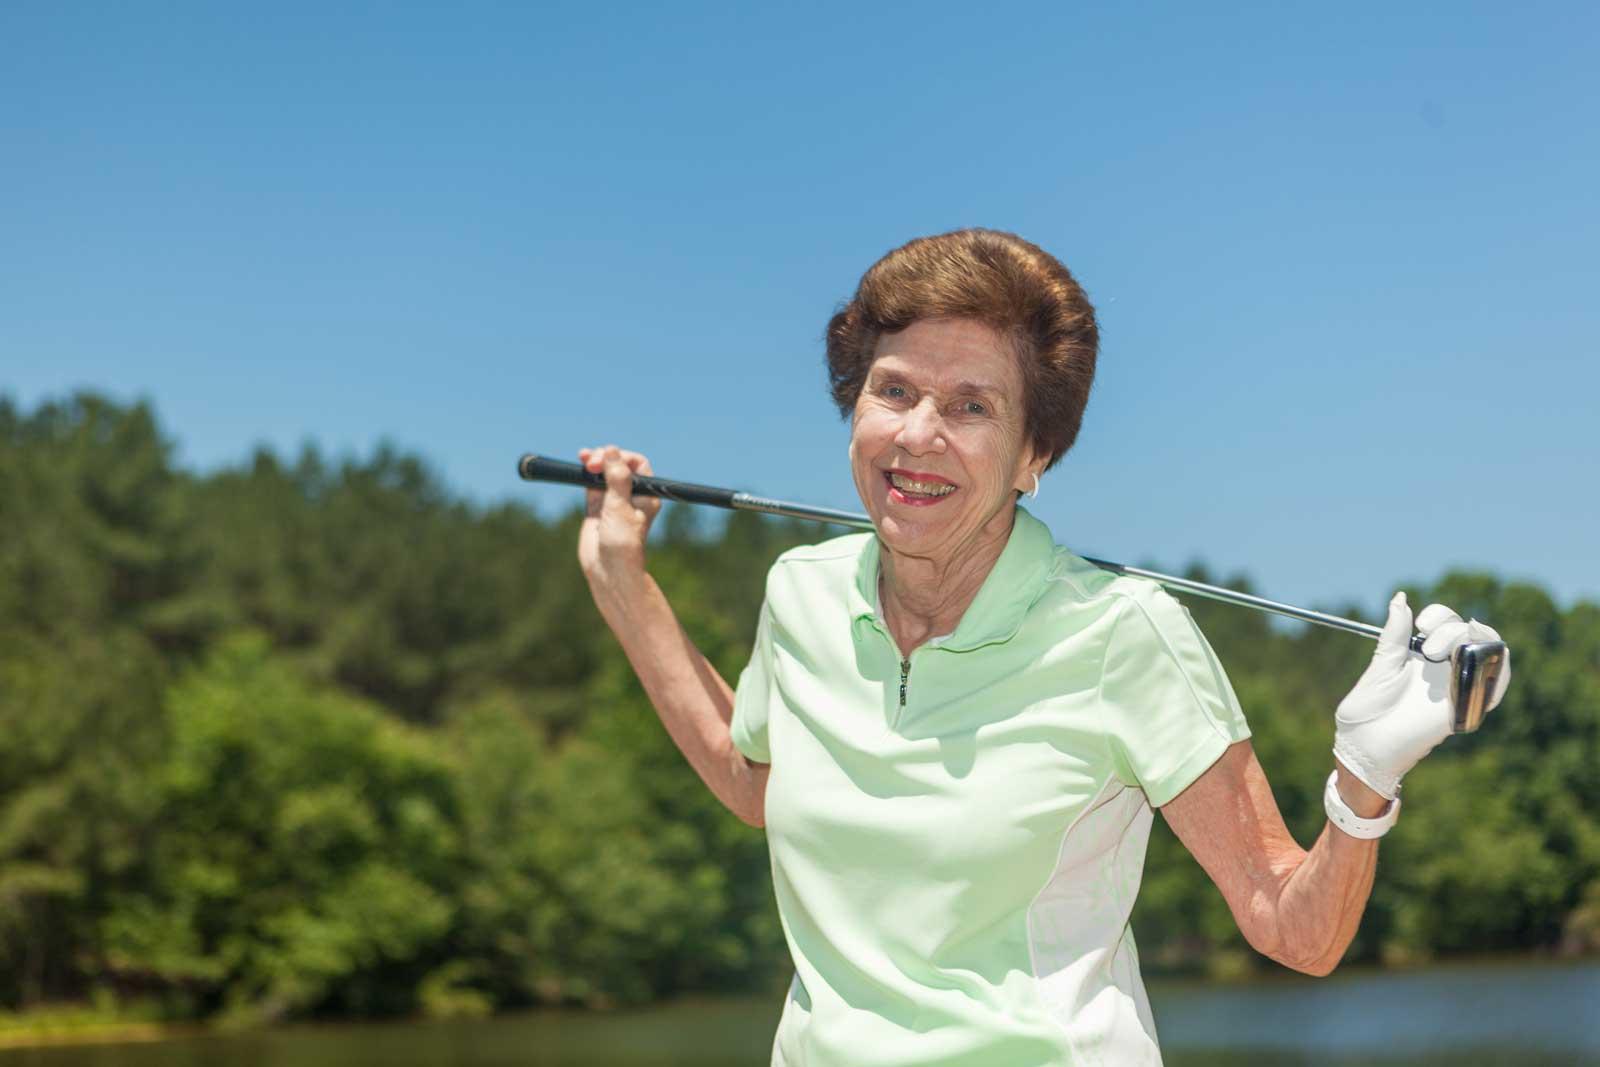 woman-enjoys-golfing